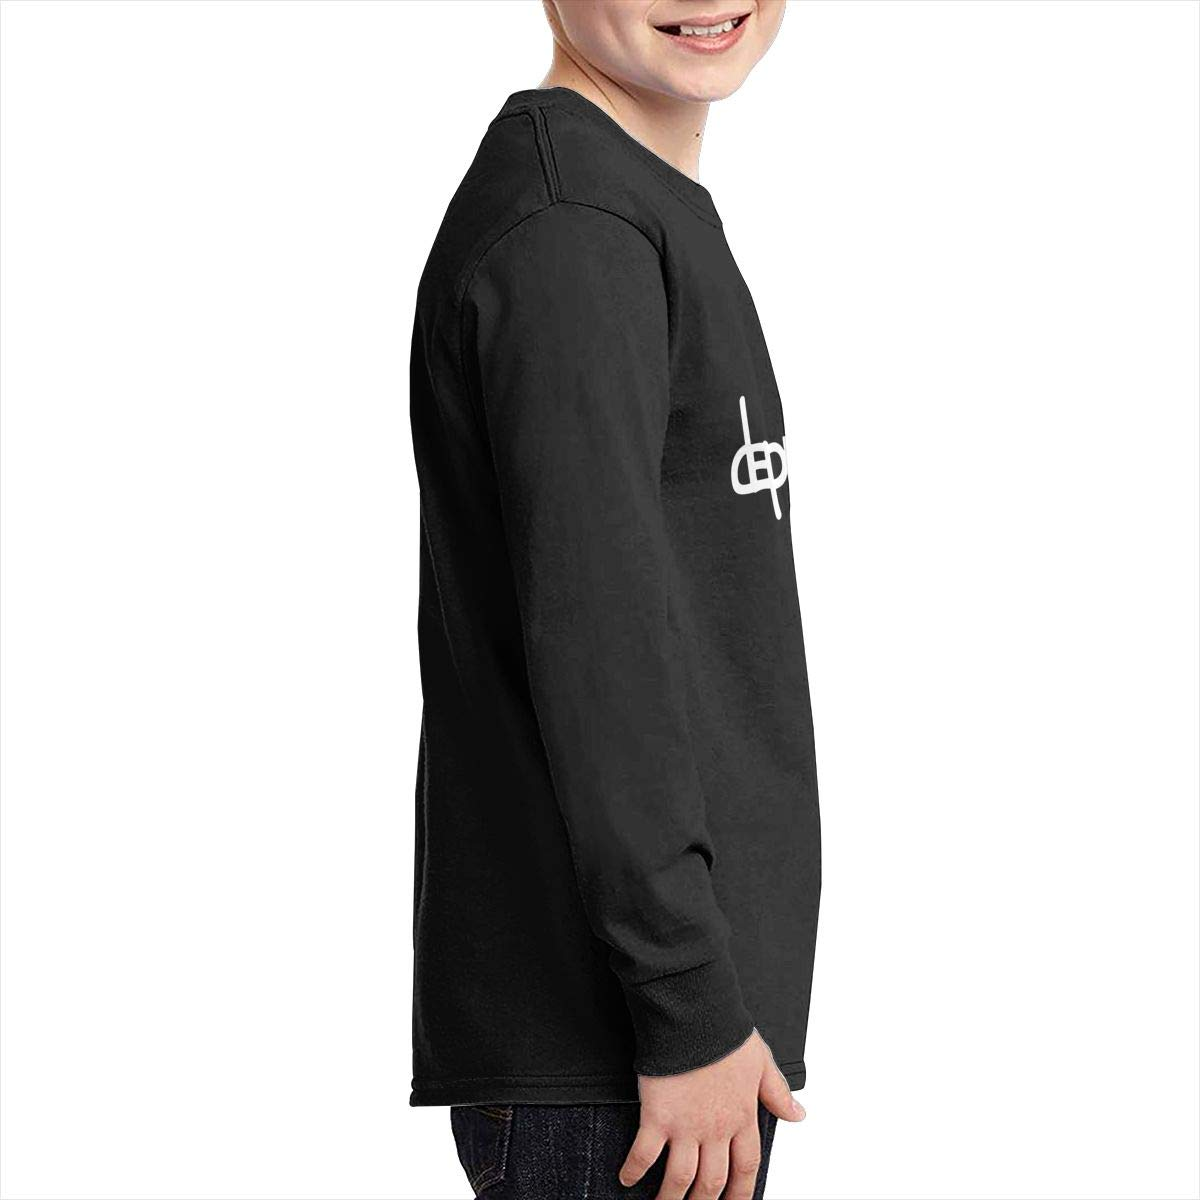 MichaelHazzard Depeche Mode Youth Wearable Long Sleeve Crewneck Tee T-Shirt for Boys and Girls